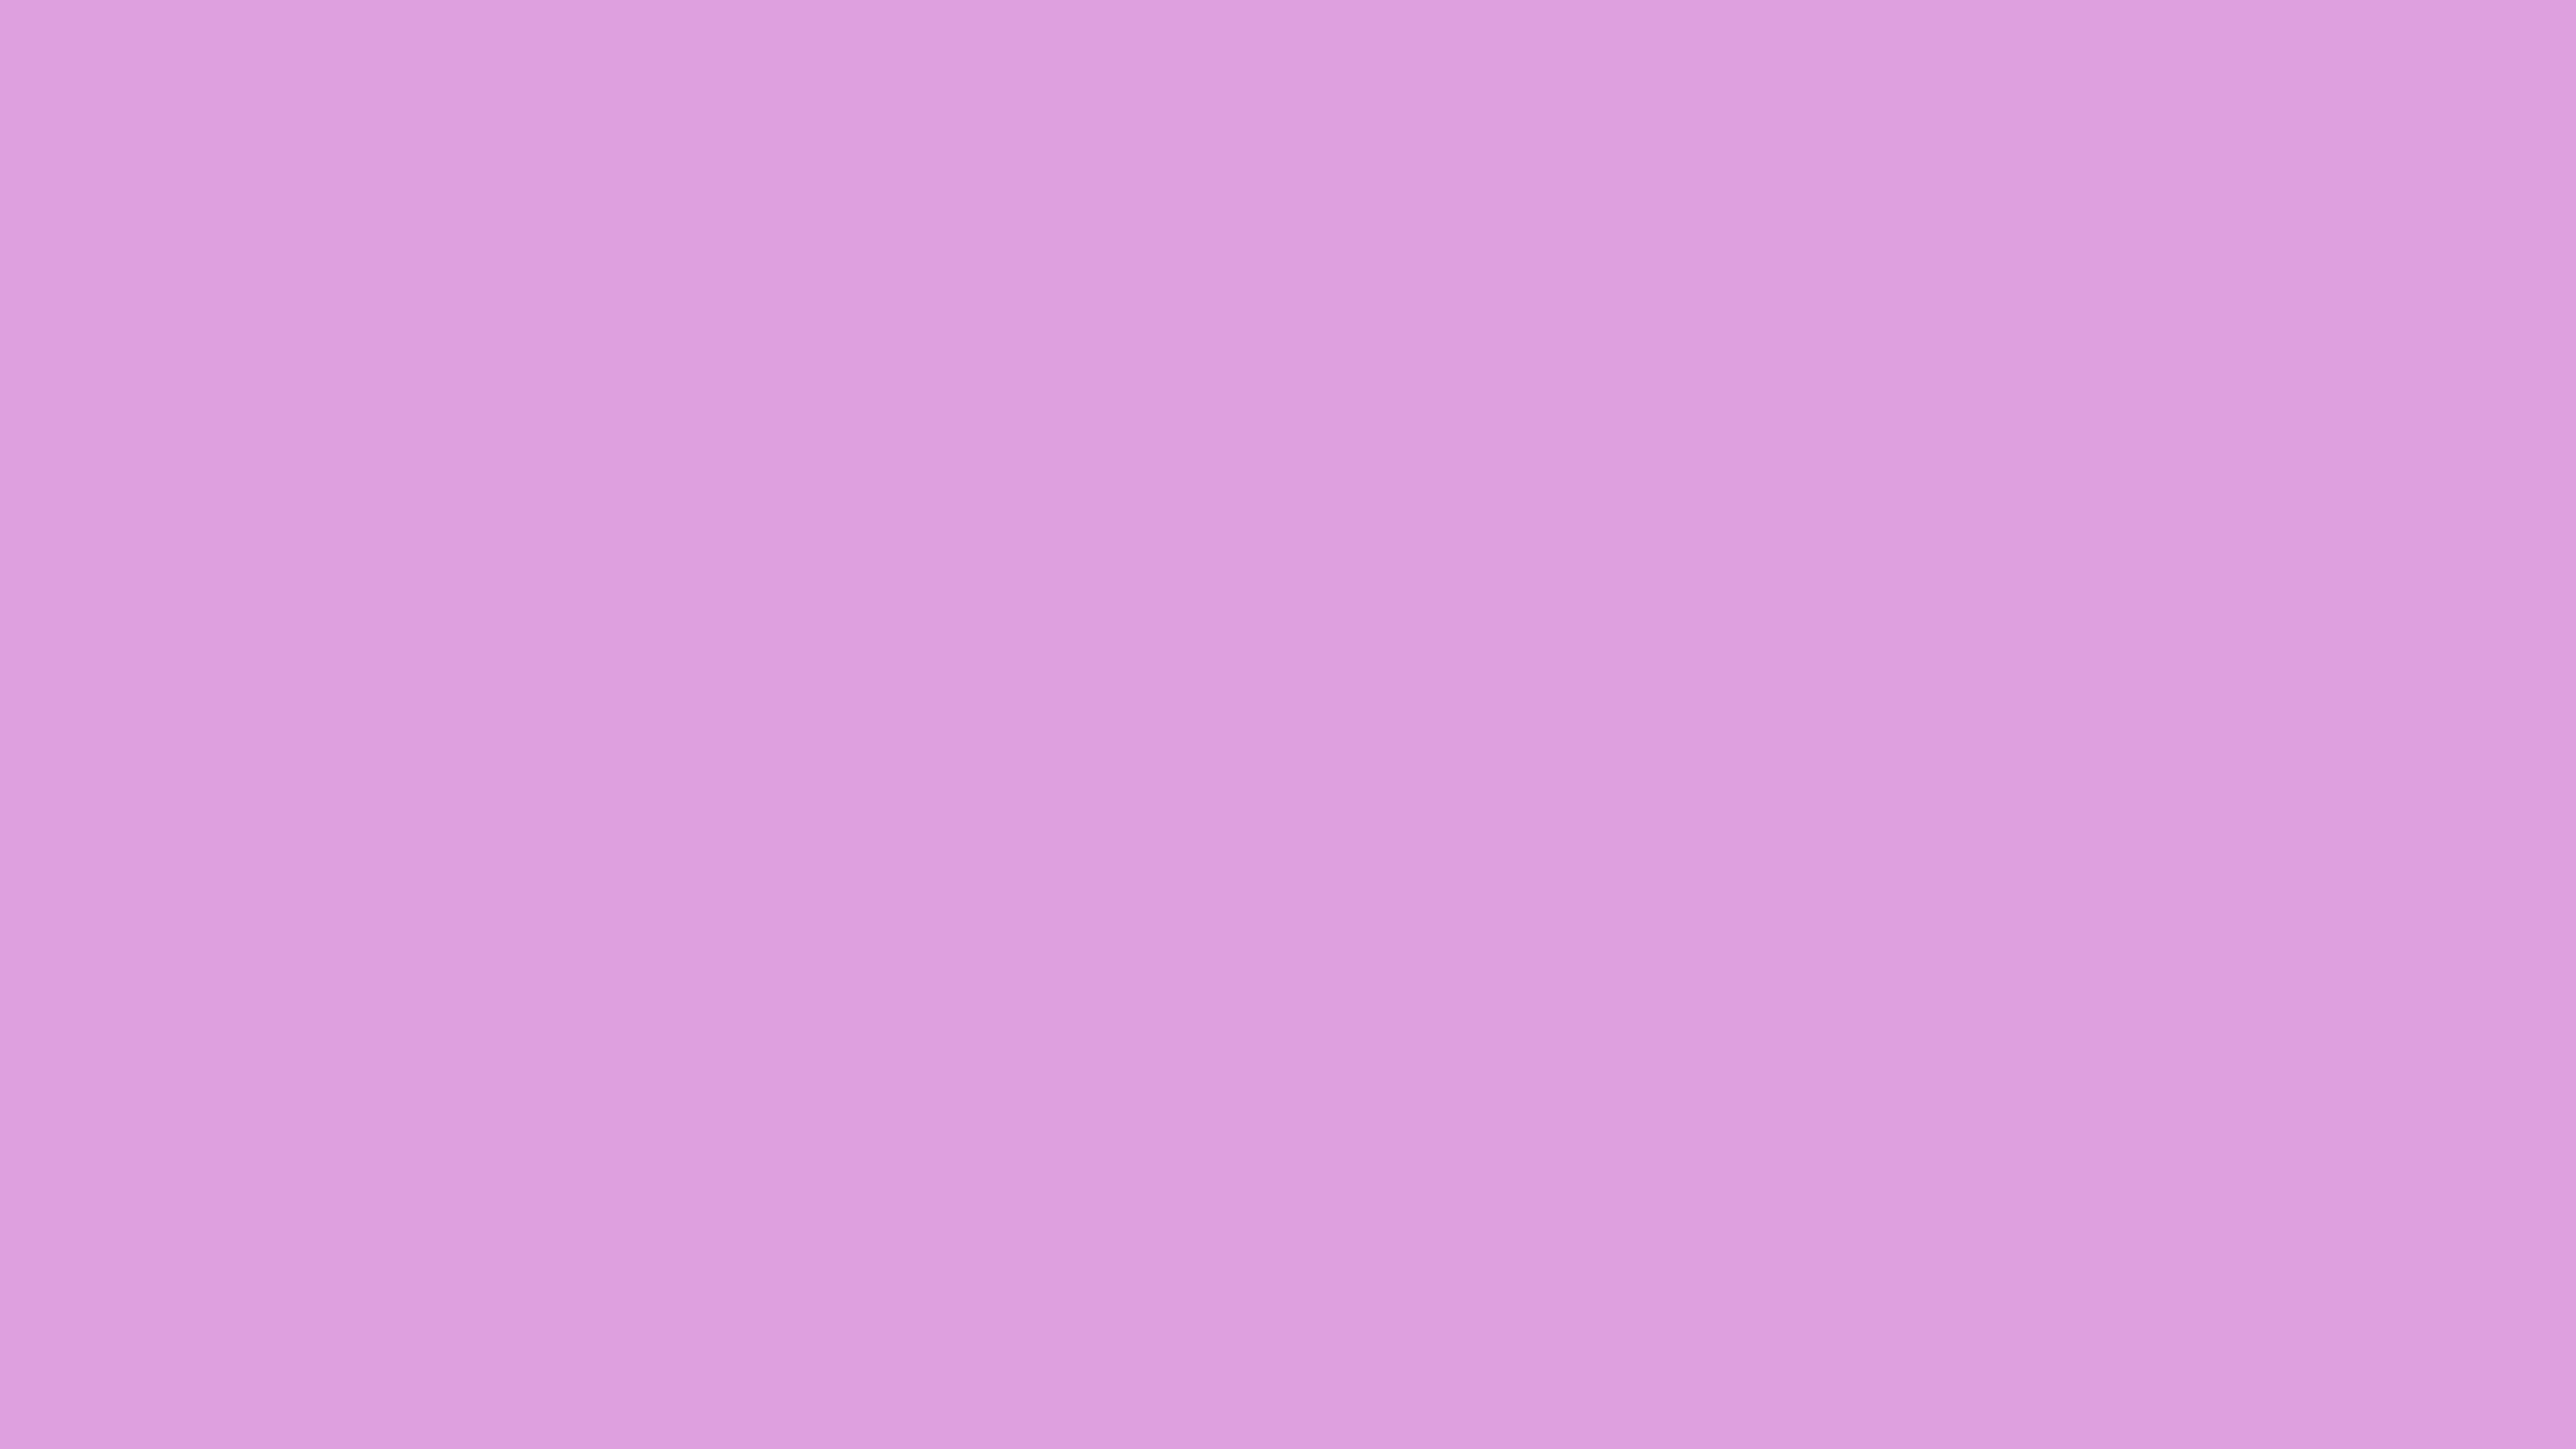 7680x4320 Plum Web Solid Color Background